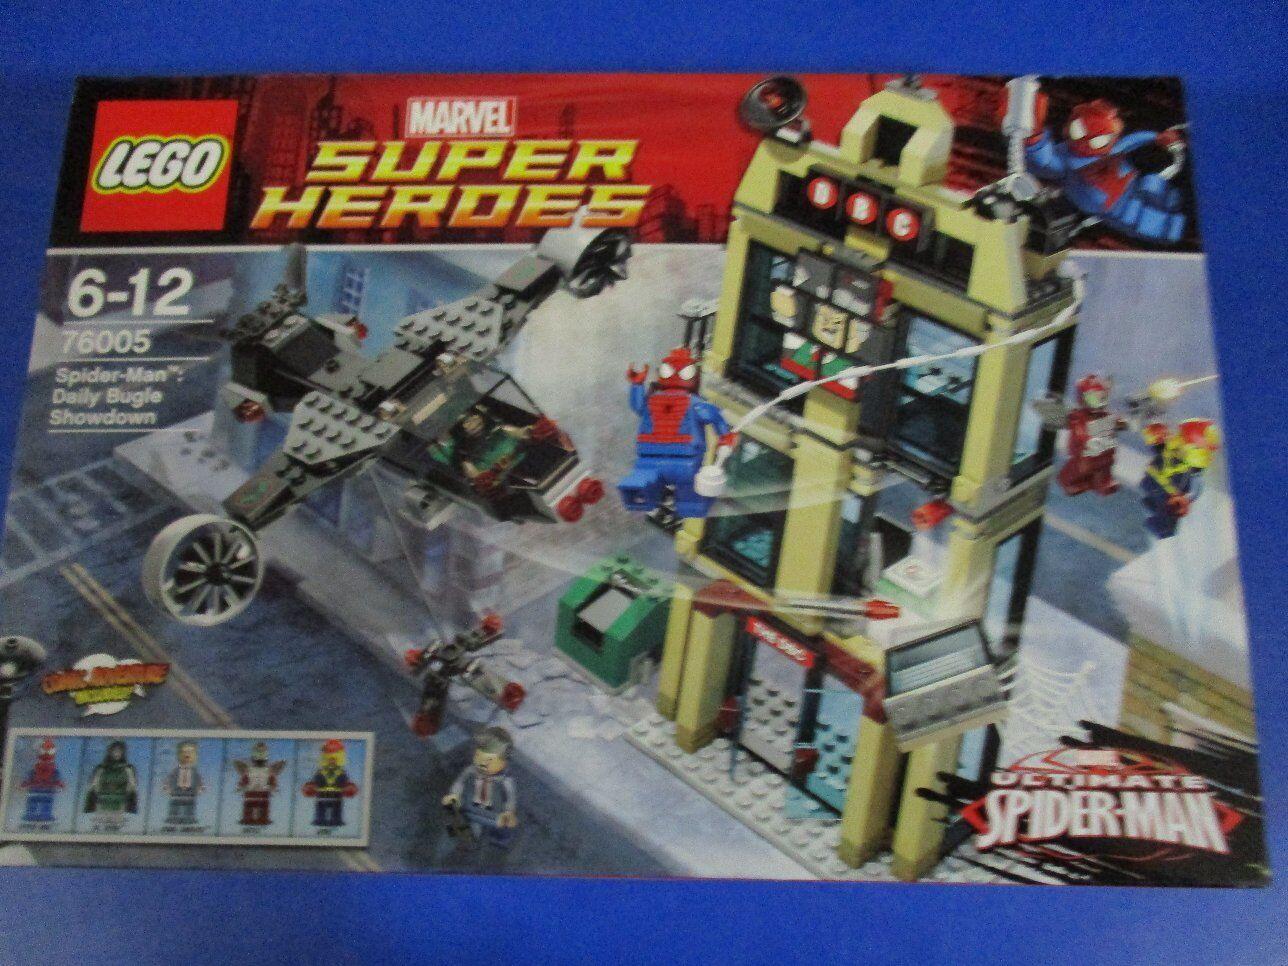 LEGO SUPER HEROES 76005 Spider-Man inserto il Daily Bugle NUOVO OVP